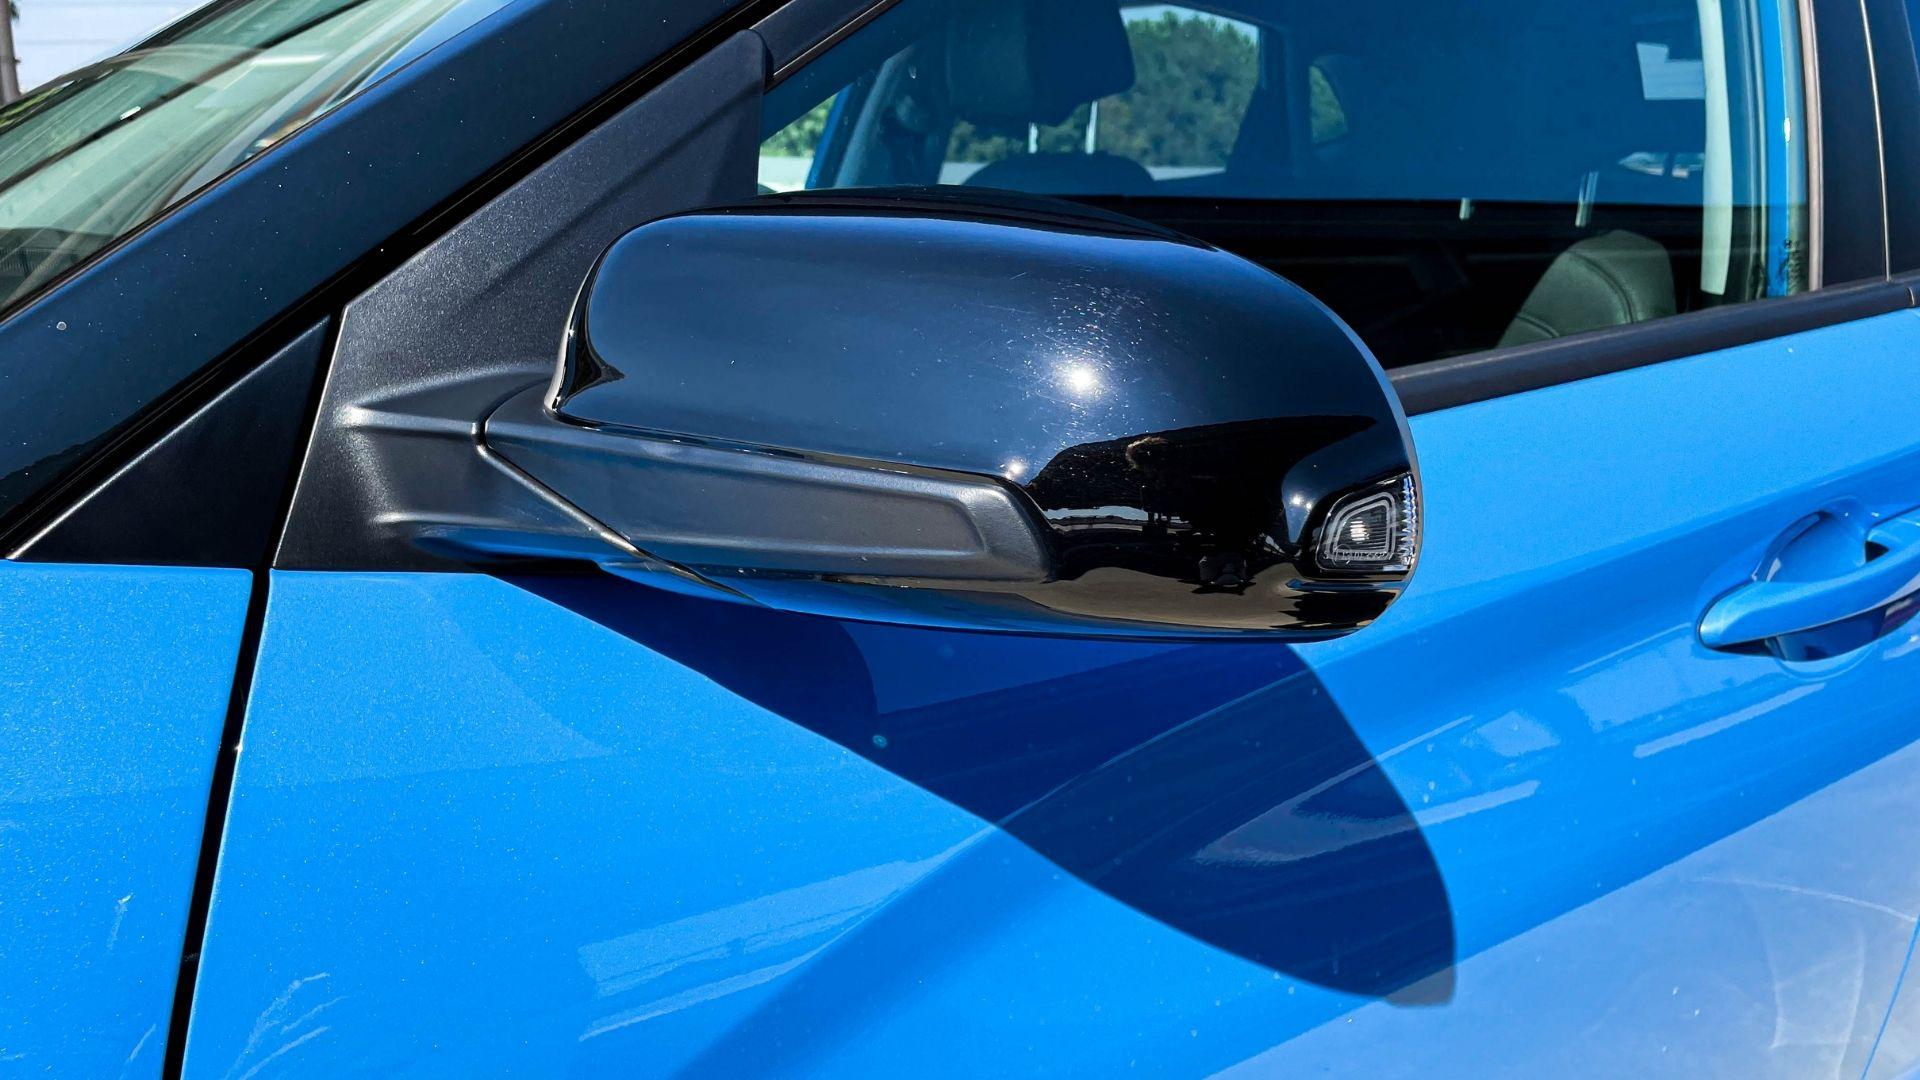 Hyundai-Kona-specchietti